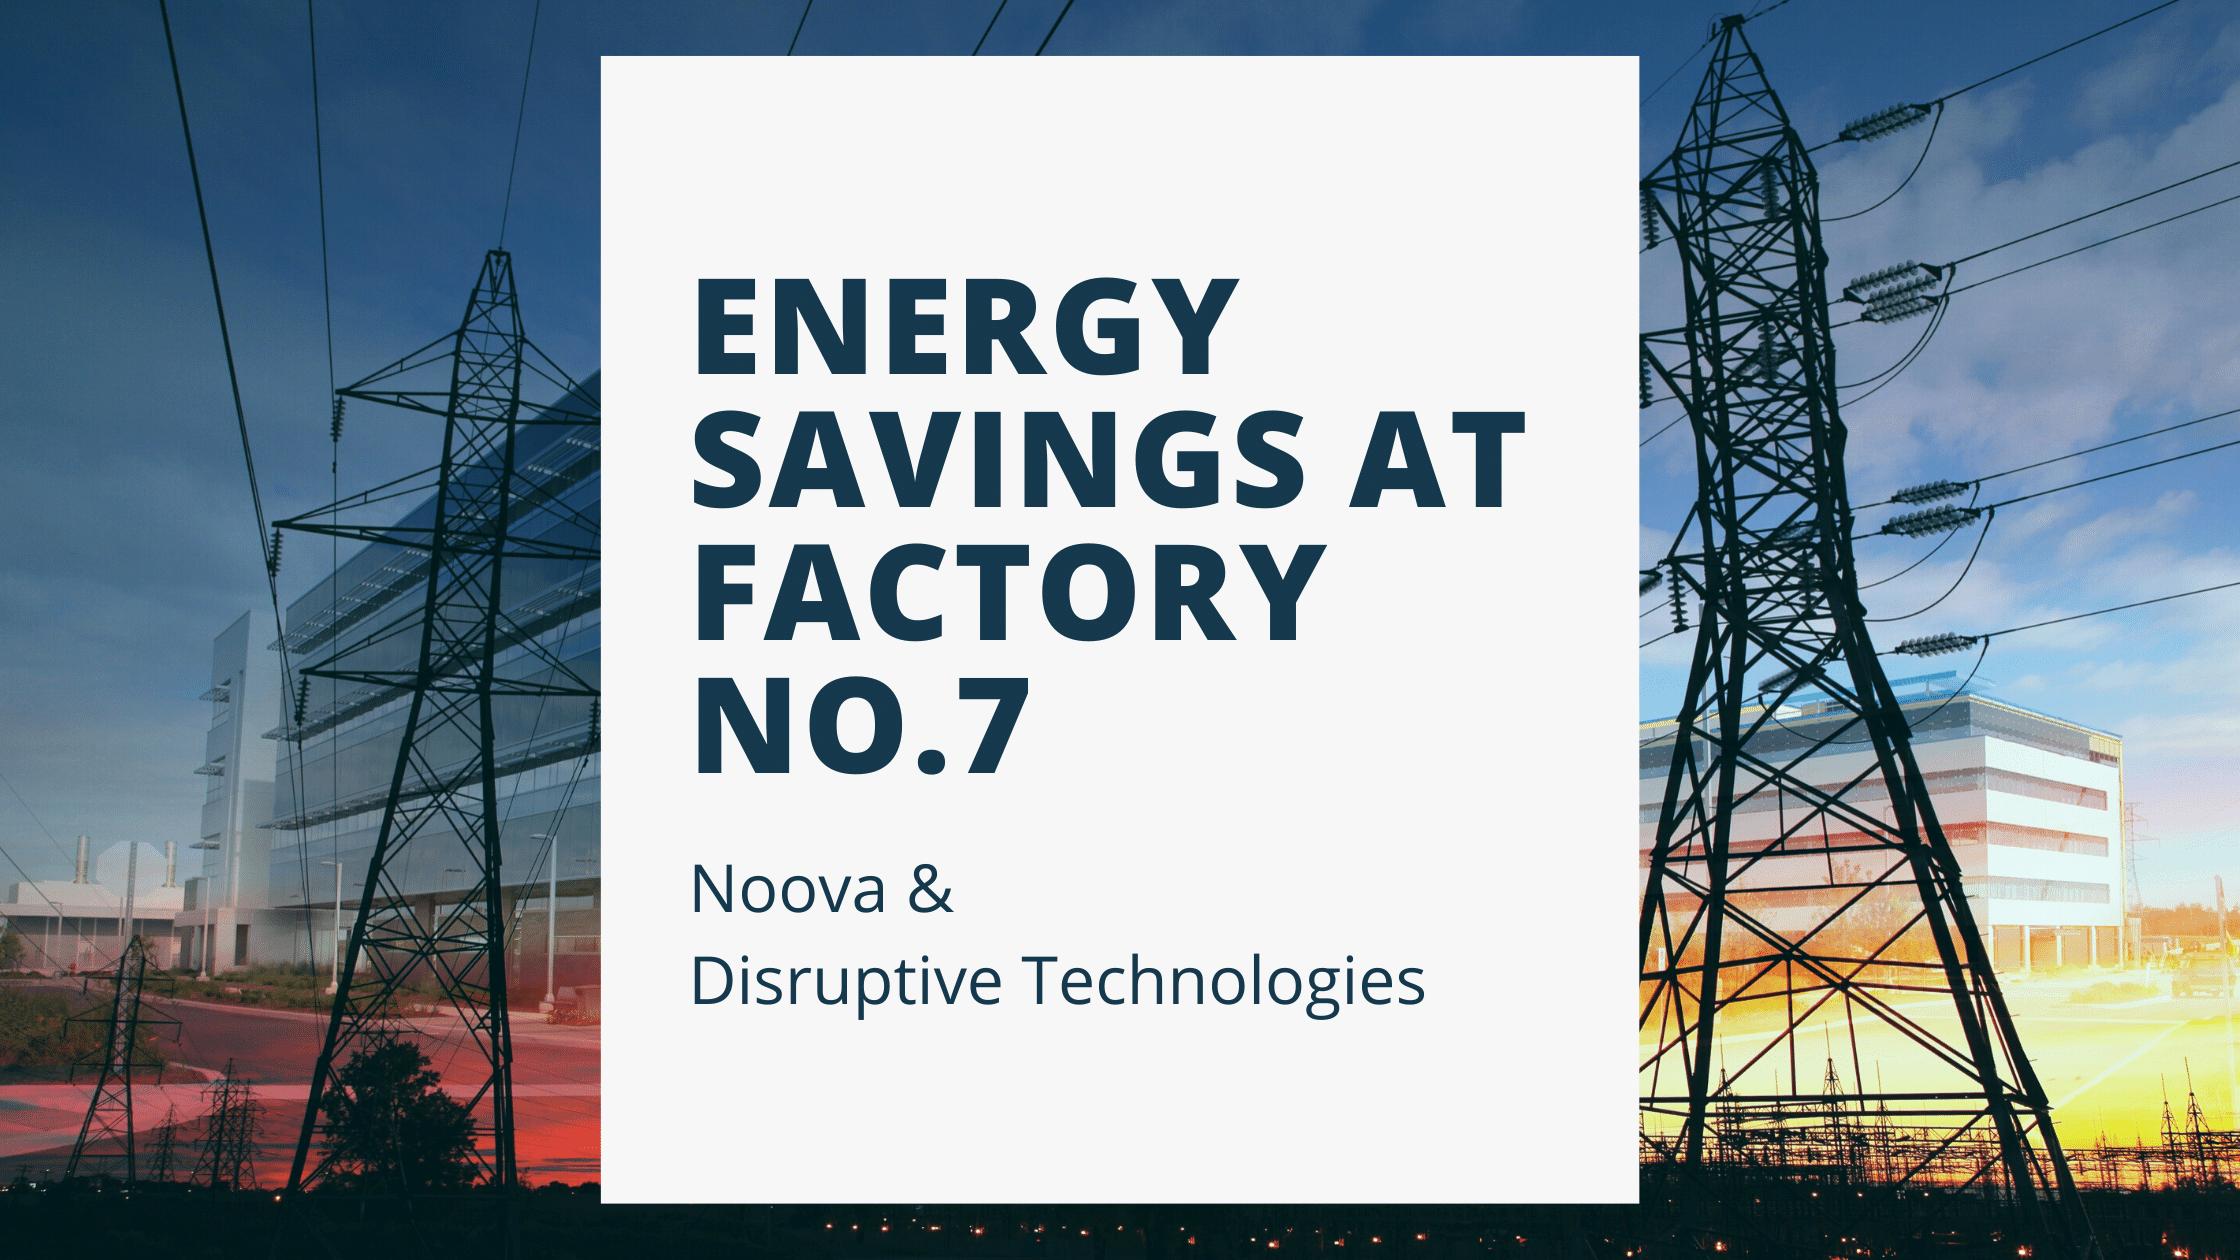 Energy Savings at Factory No. 7 Property with Noova & Disruptive Technologies